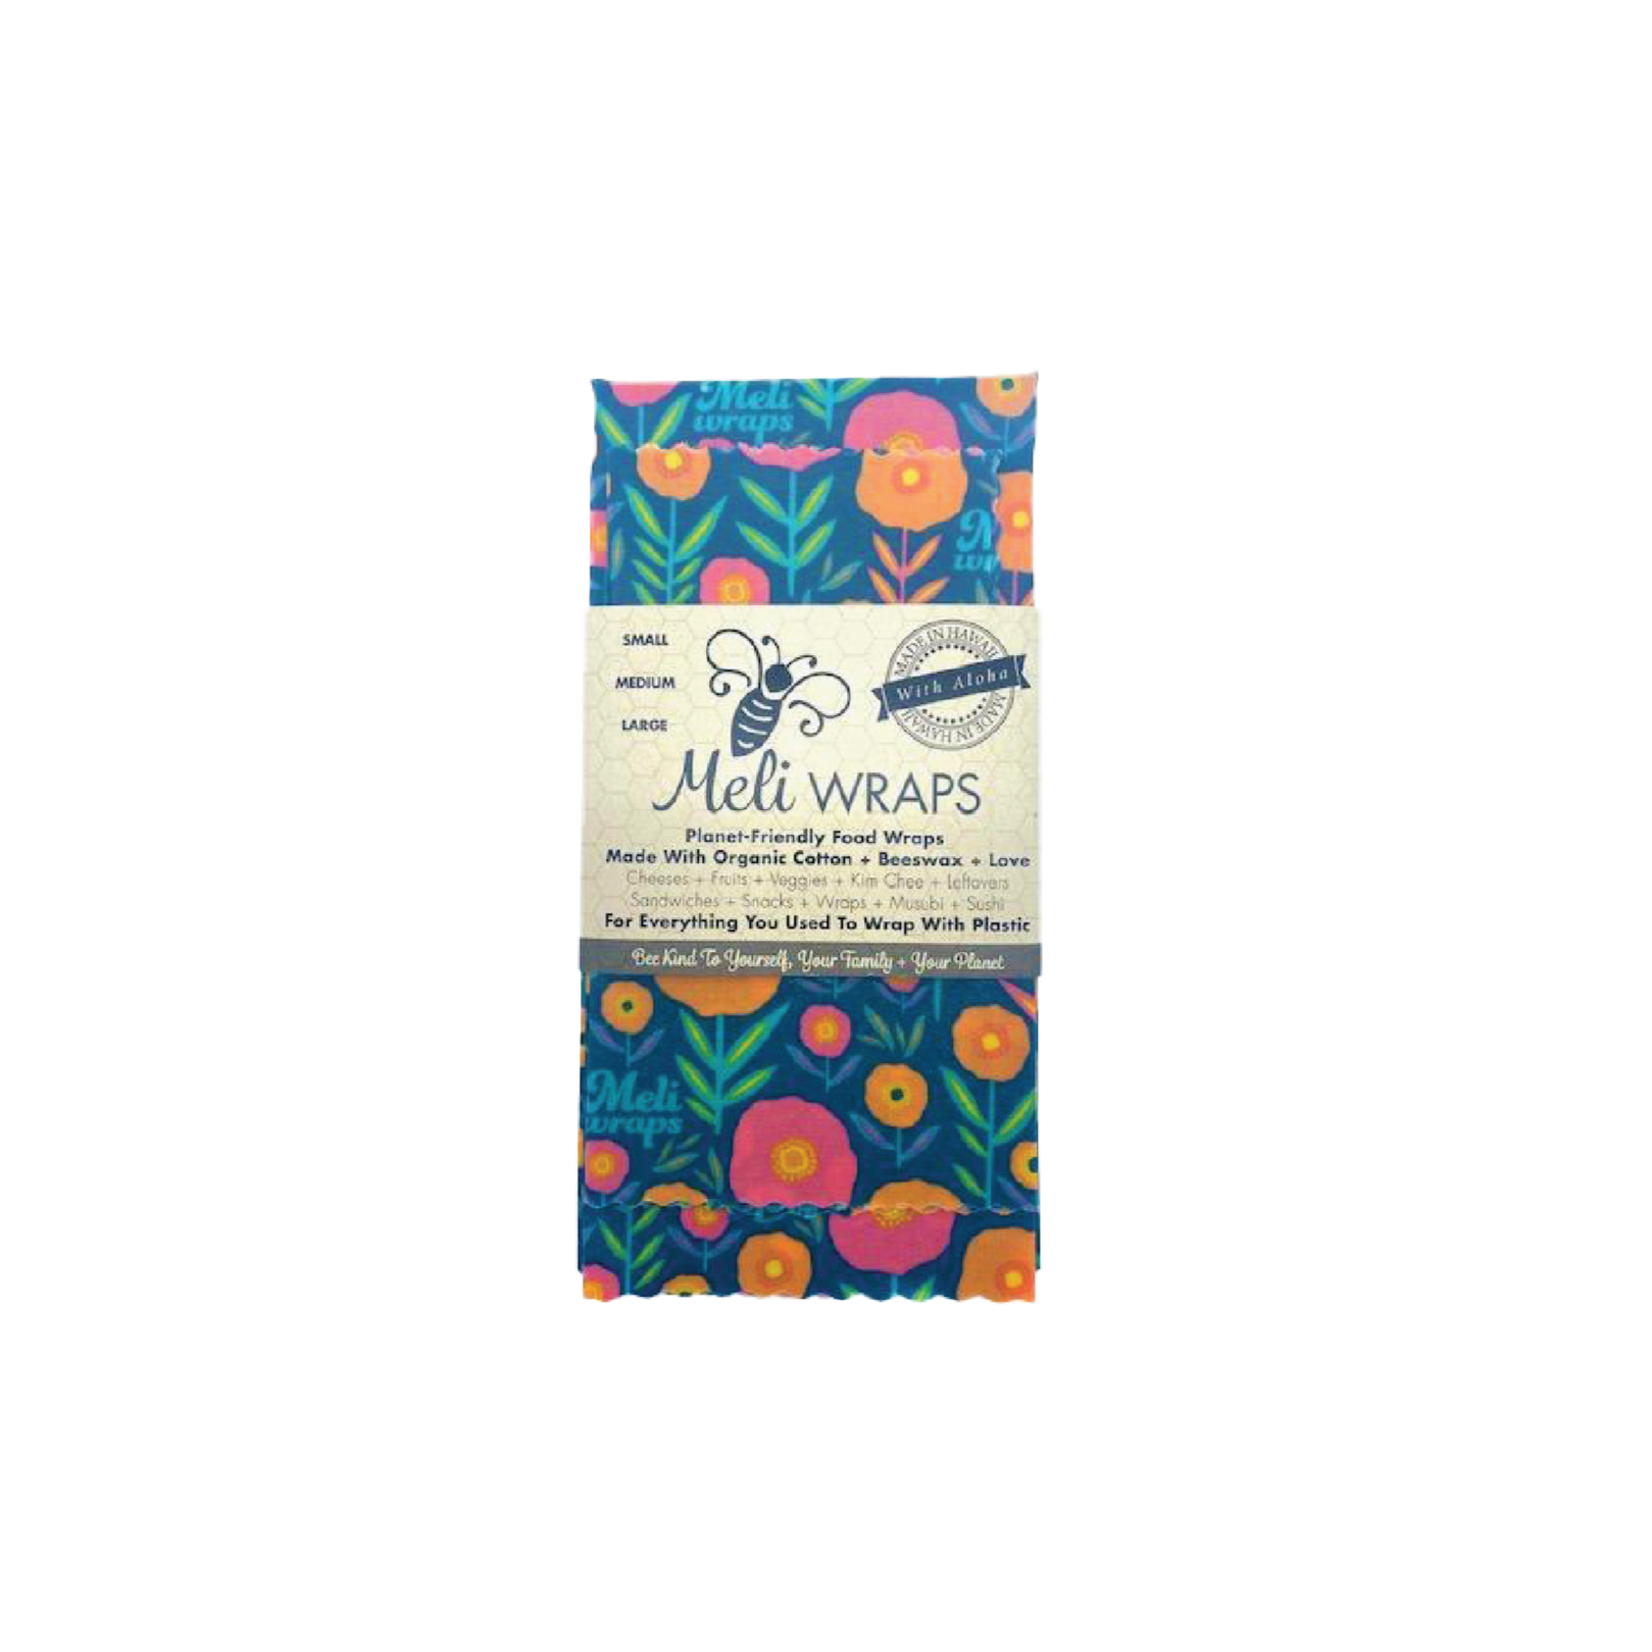 Meli Wraps Reusable Beeswax Food Wraps (3 Pack)